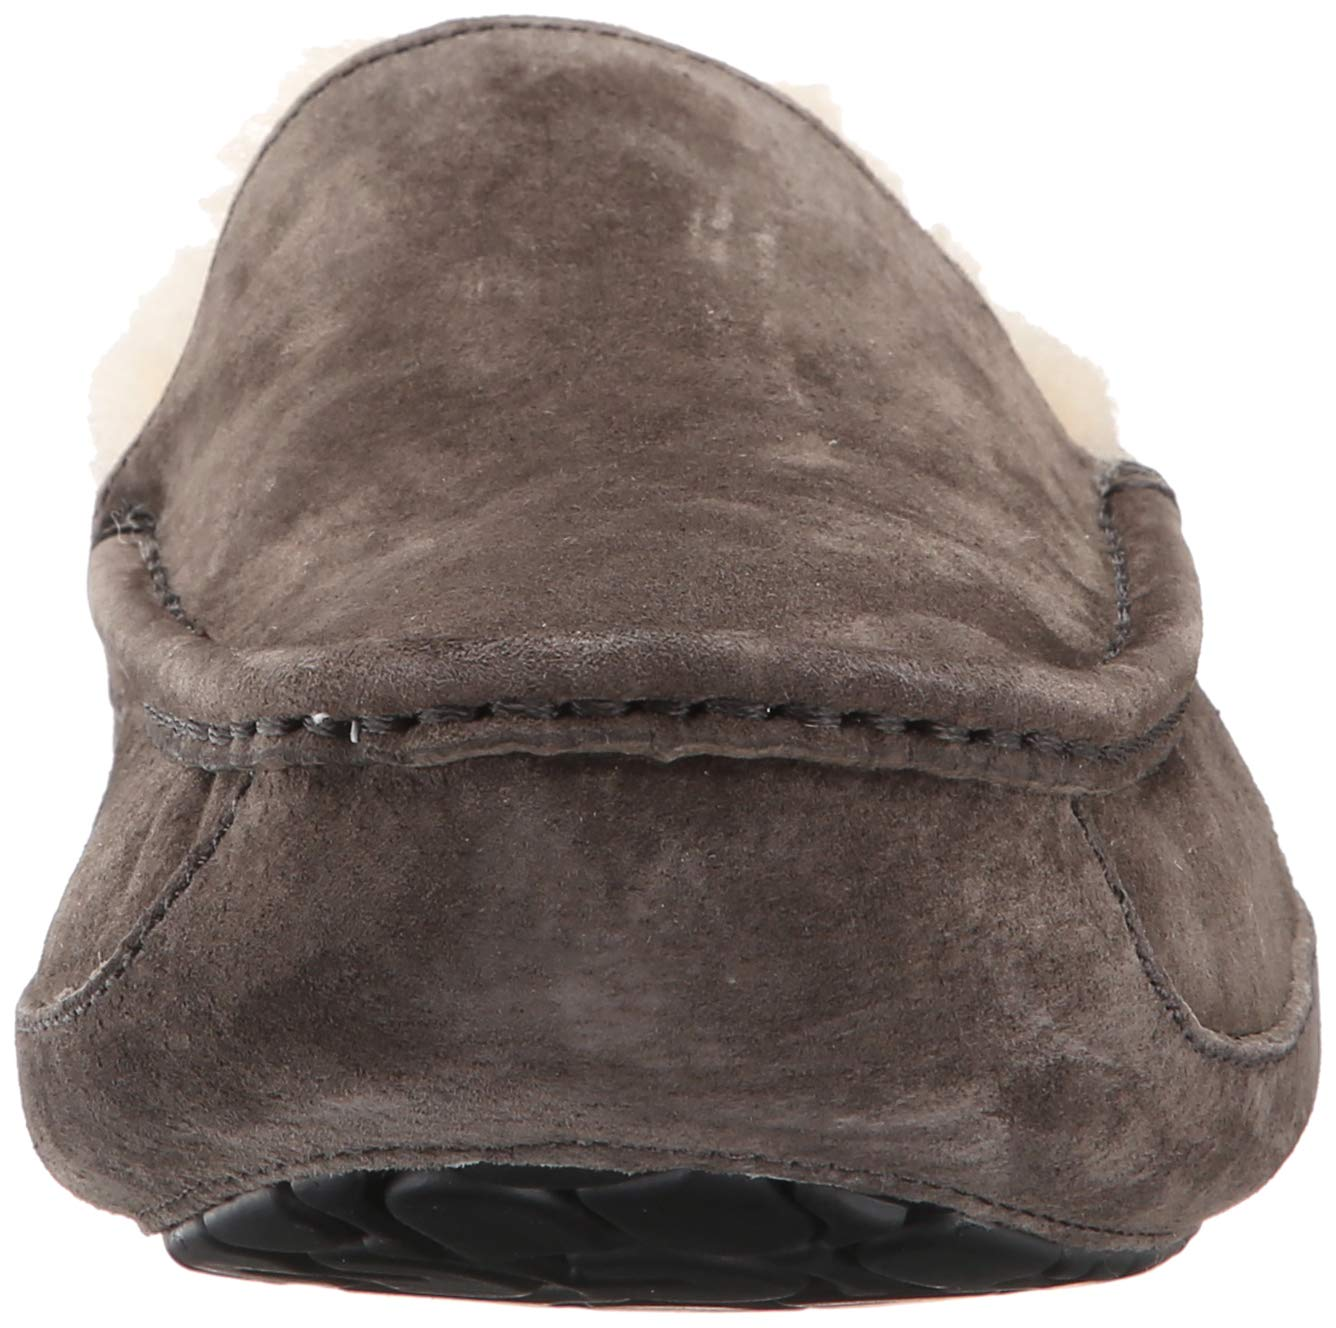 UGG Men's Ascot Slipper, Charcoal, 12 M US by UGG (Image #4)